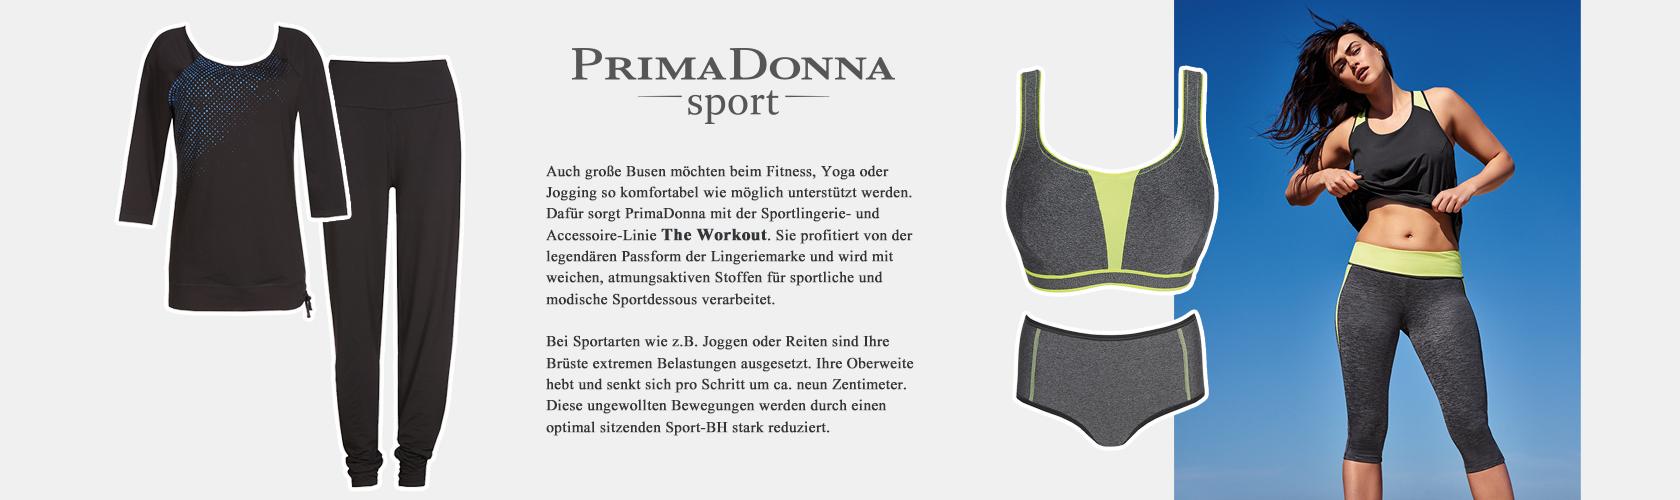 Slideshow PD Sport 05.07.